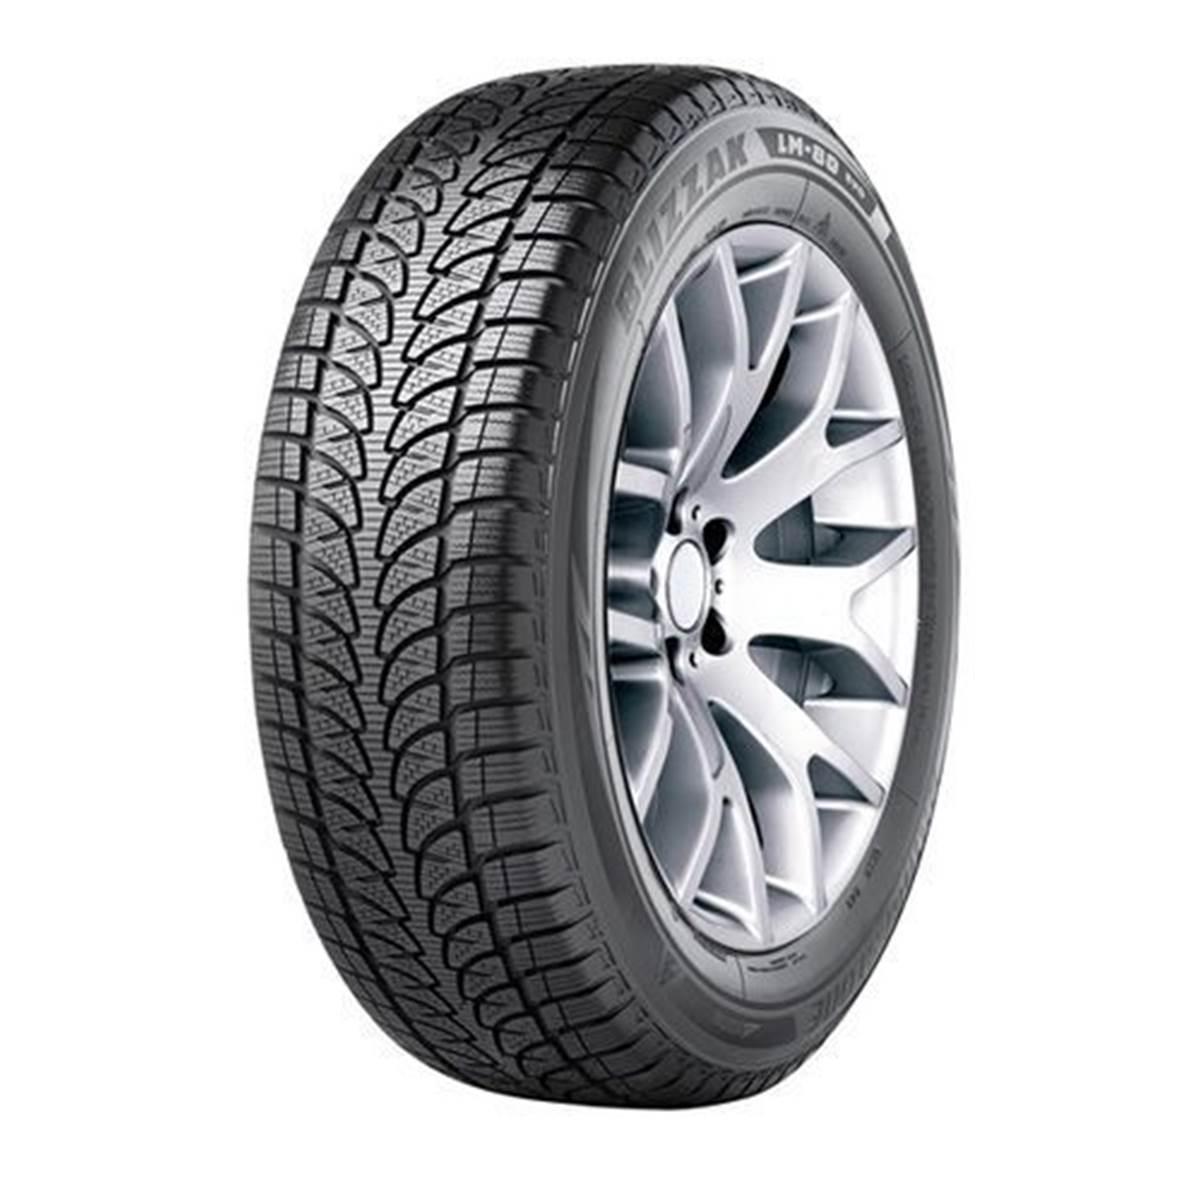 Pneu Hiver Bridgestone 215/65R16 102H Blizzak Lm80 Evo XL